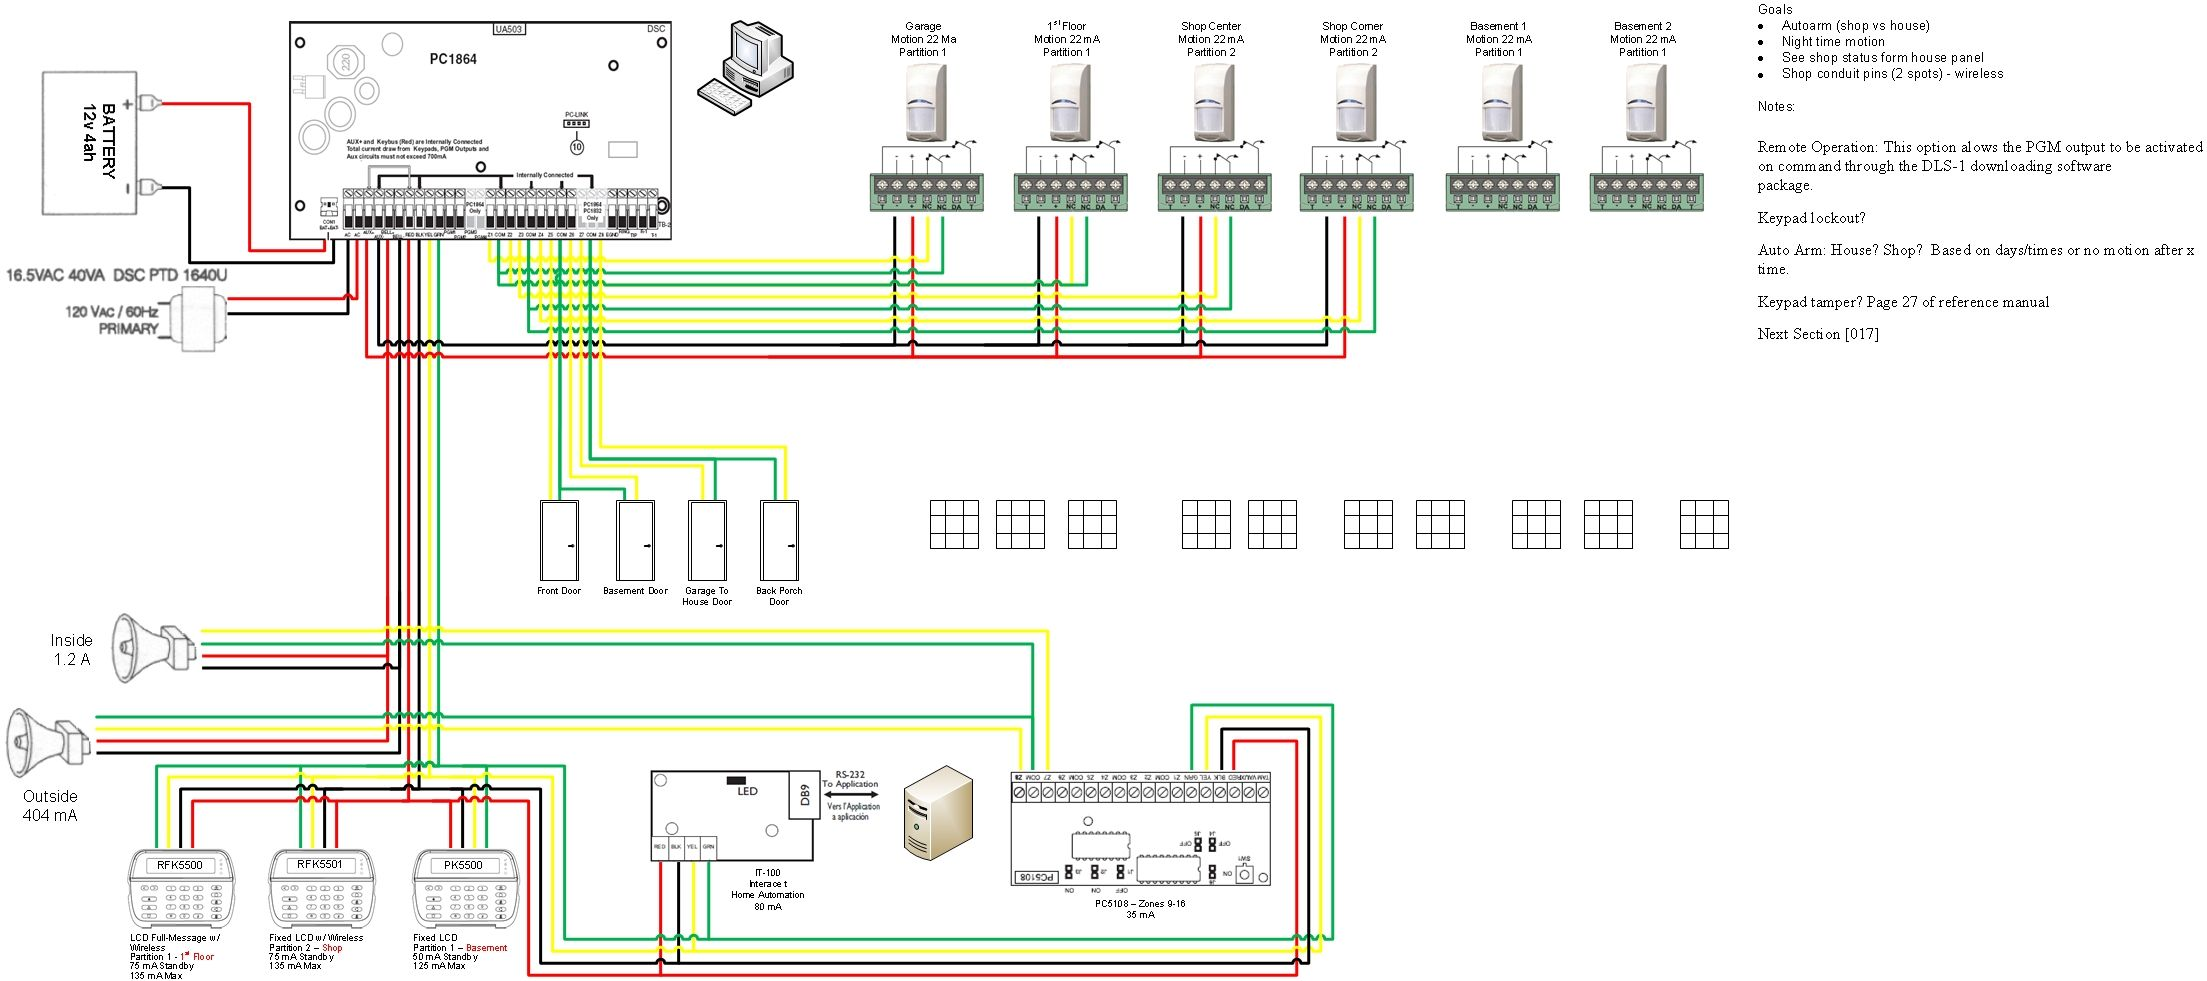 medium resolution of dsc alarm box wiring diagram wiring diagrams bib dsc neo wiring diagram dsc wiring diagram